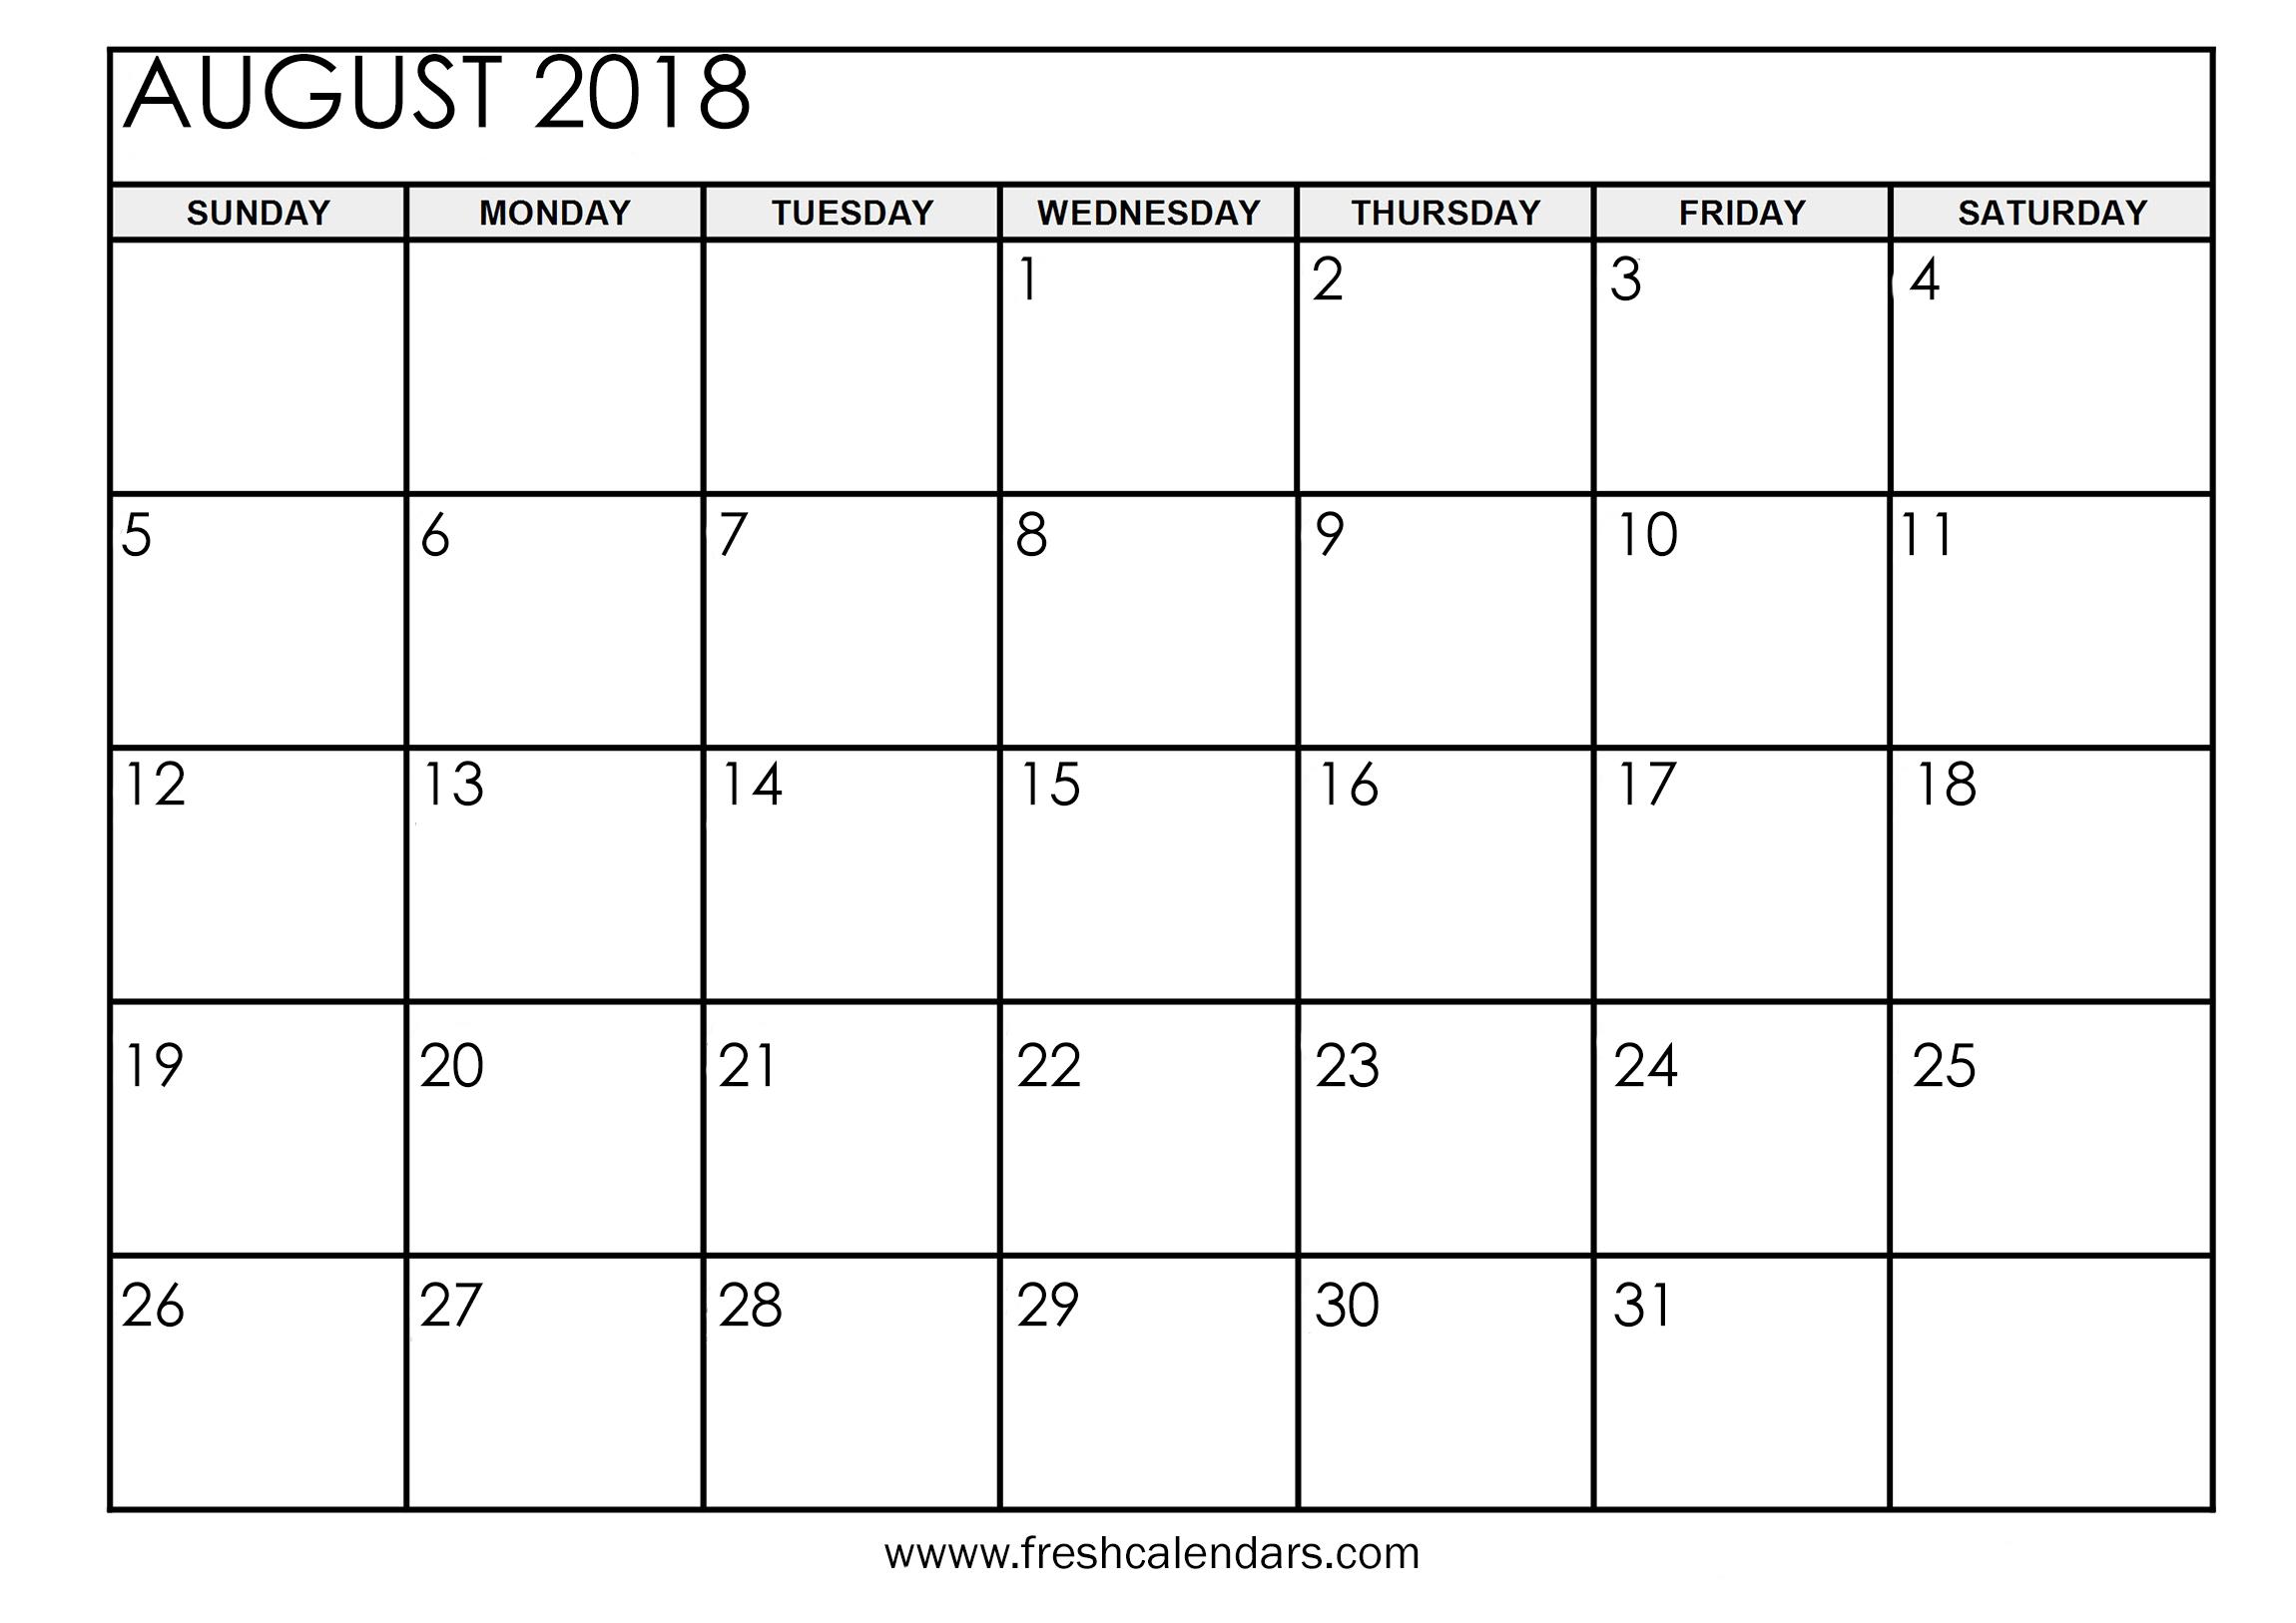 August 2018 Calendar Printable - Fresh Calendars with Blank Calendar Printable August